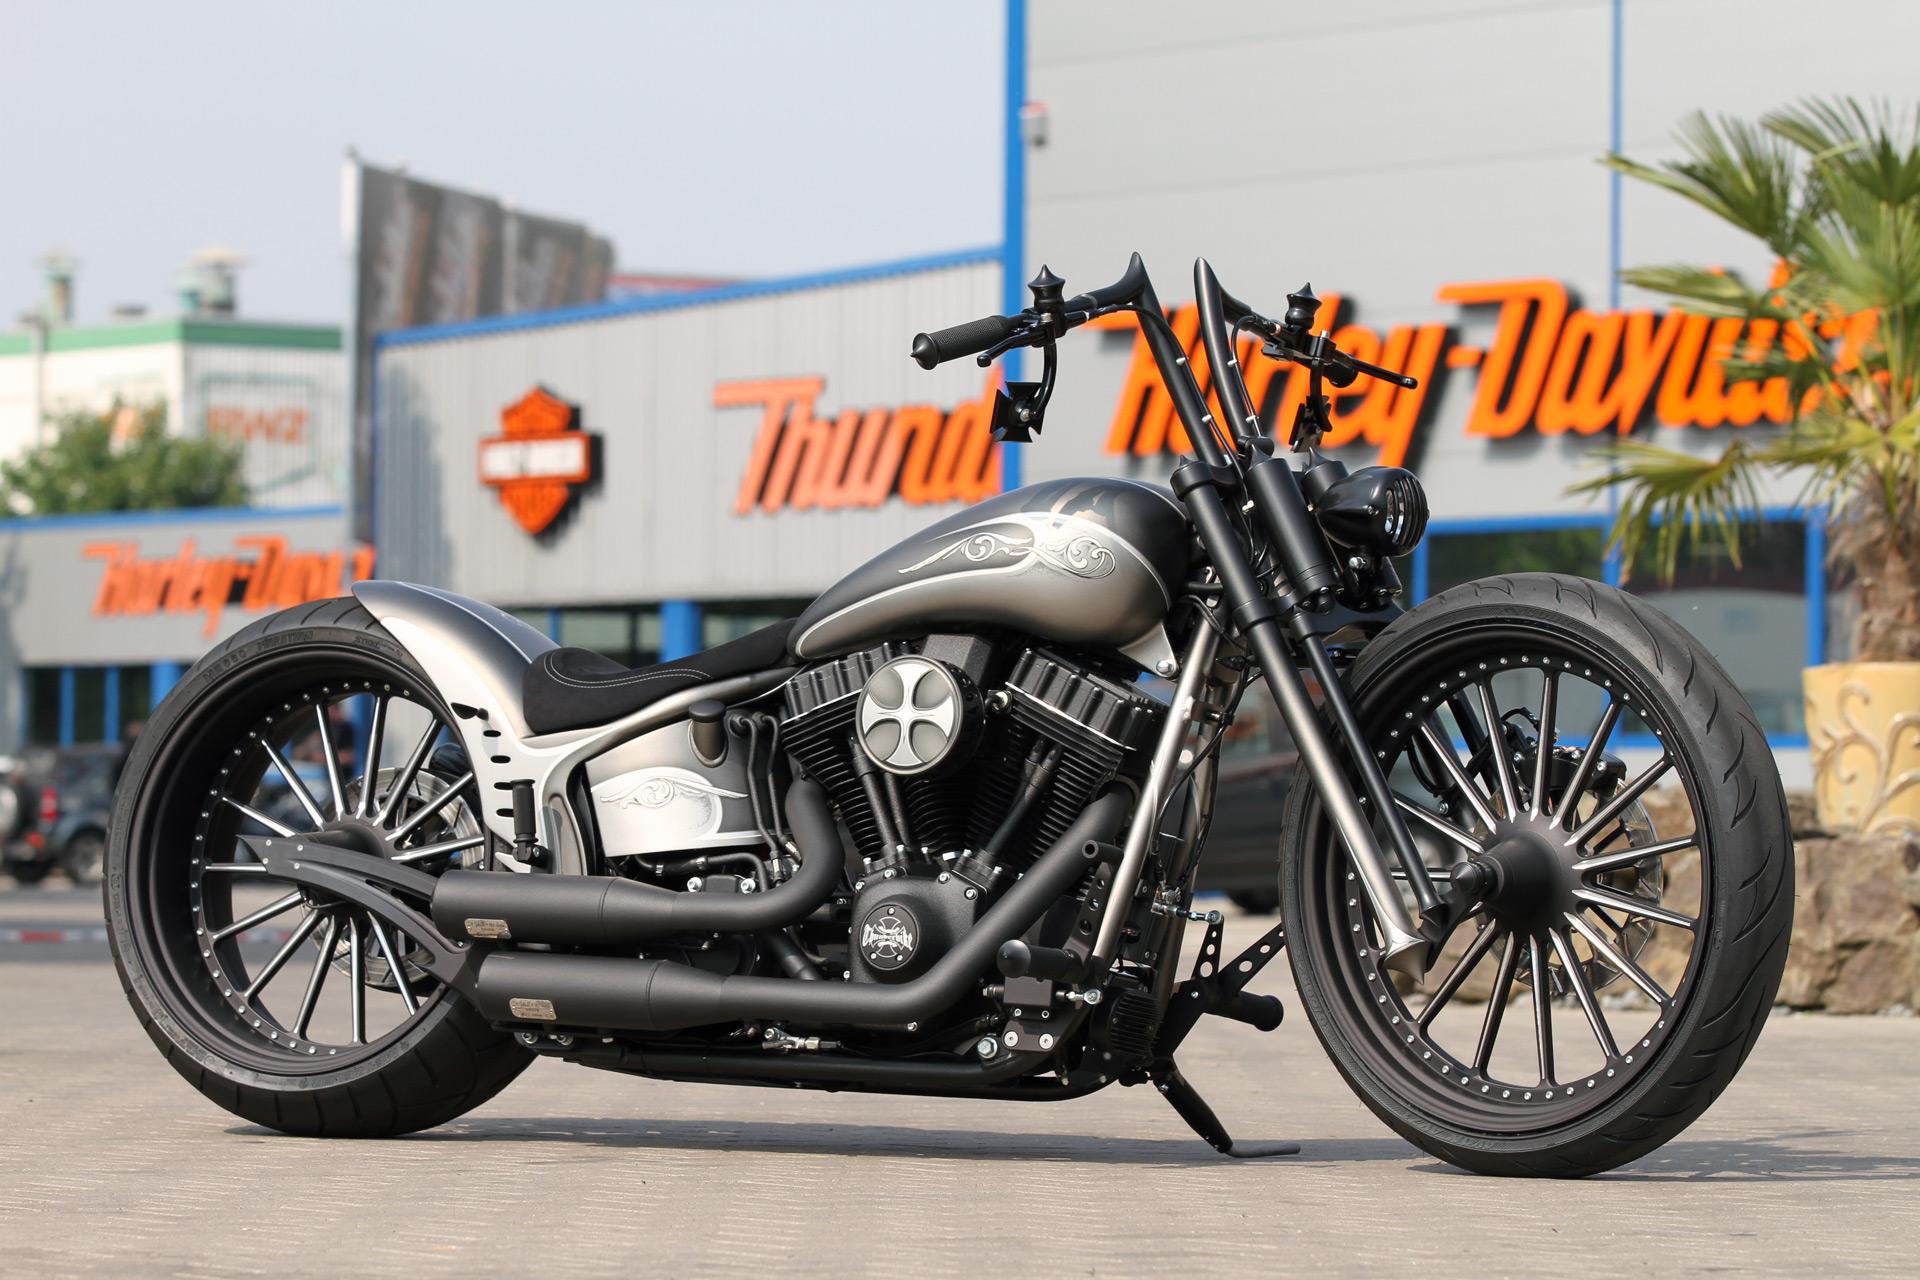 thunderbike spoke rad f r xv1700 warrior im thunderbike shop. Black Bedroom Furniture Sets. Home Design Ideas